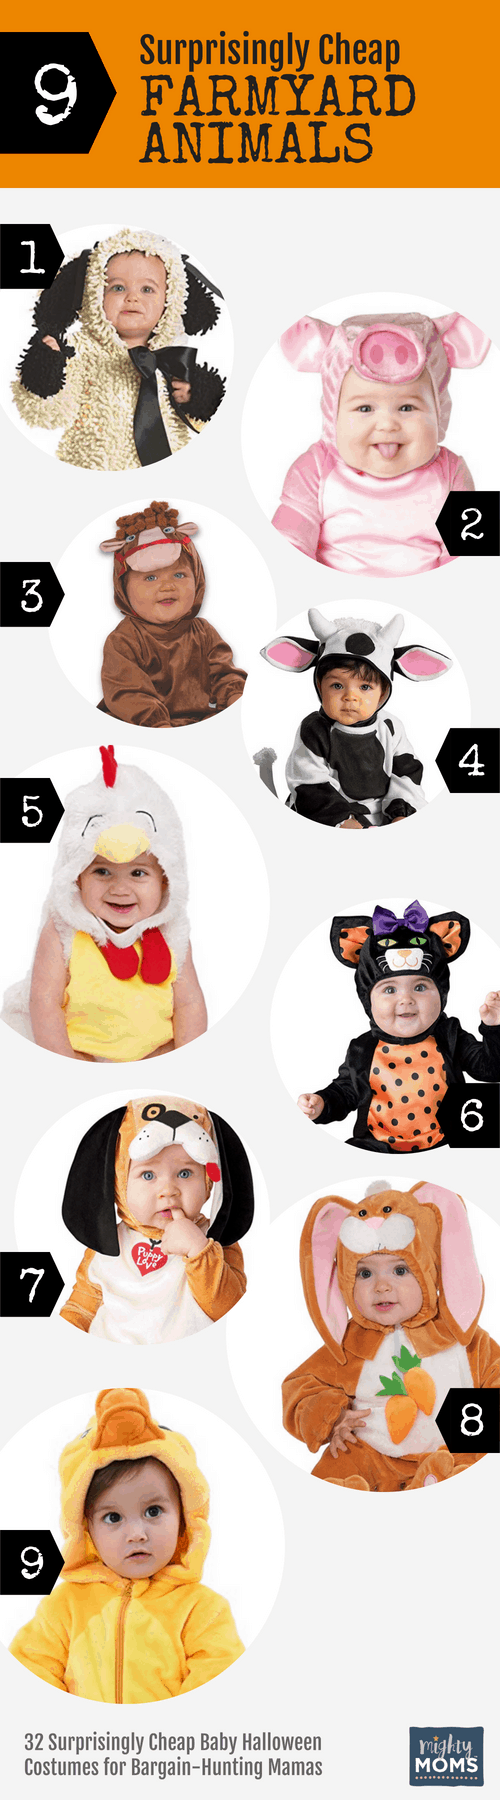 Cheap Farmyard Baby Halloween Costumes - MightyMoms.club